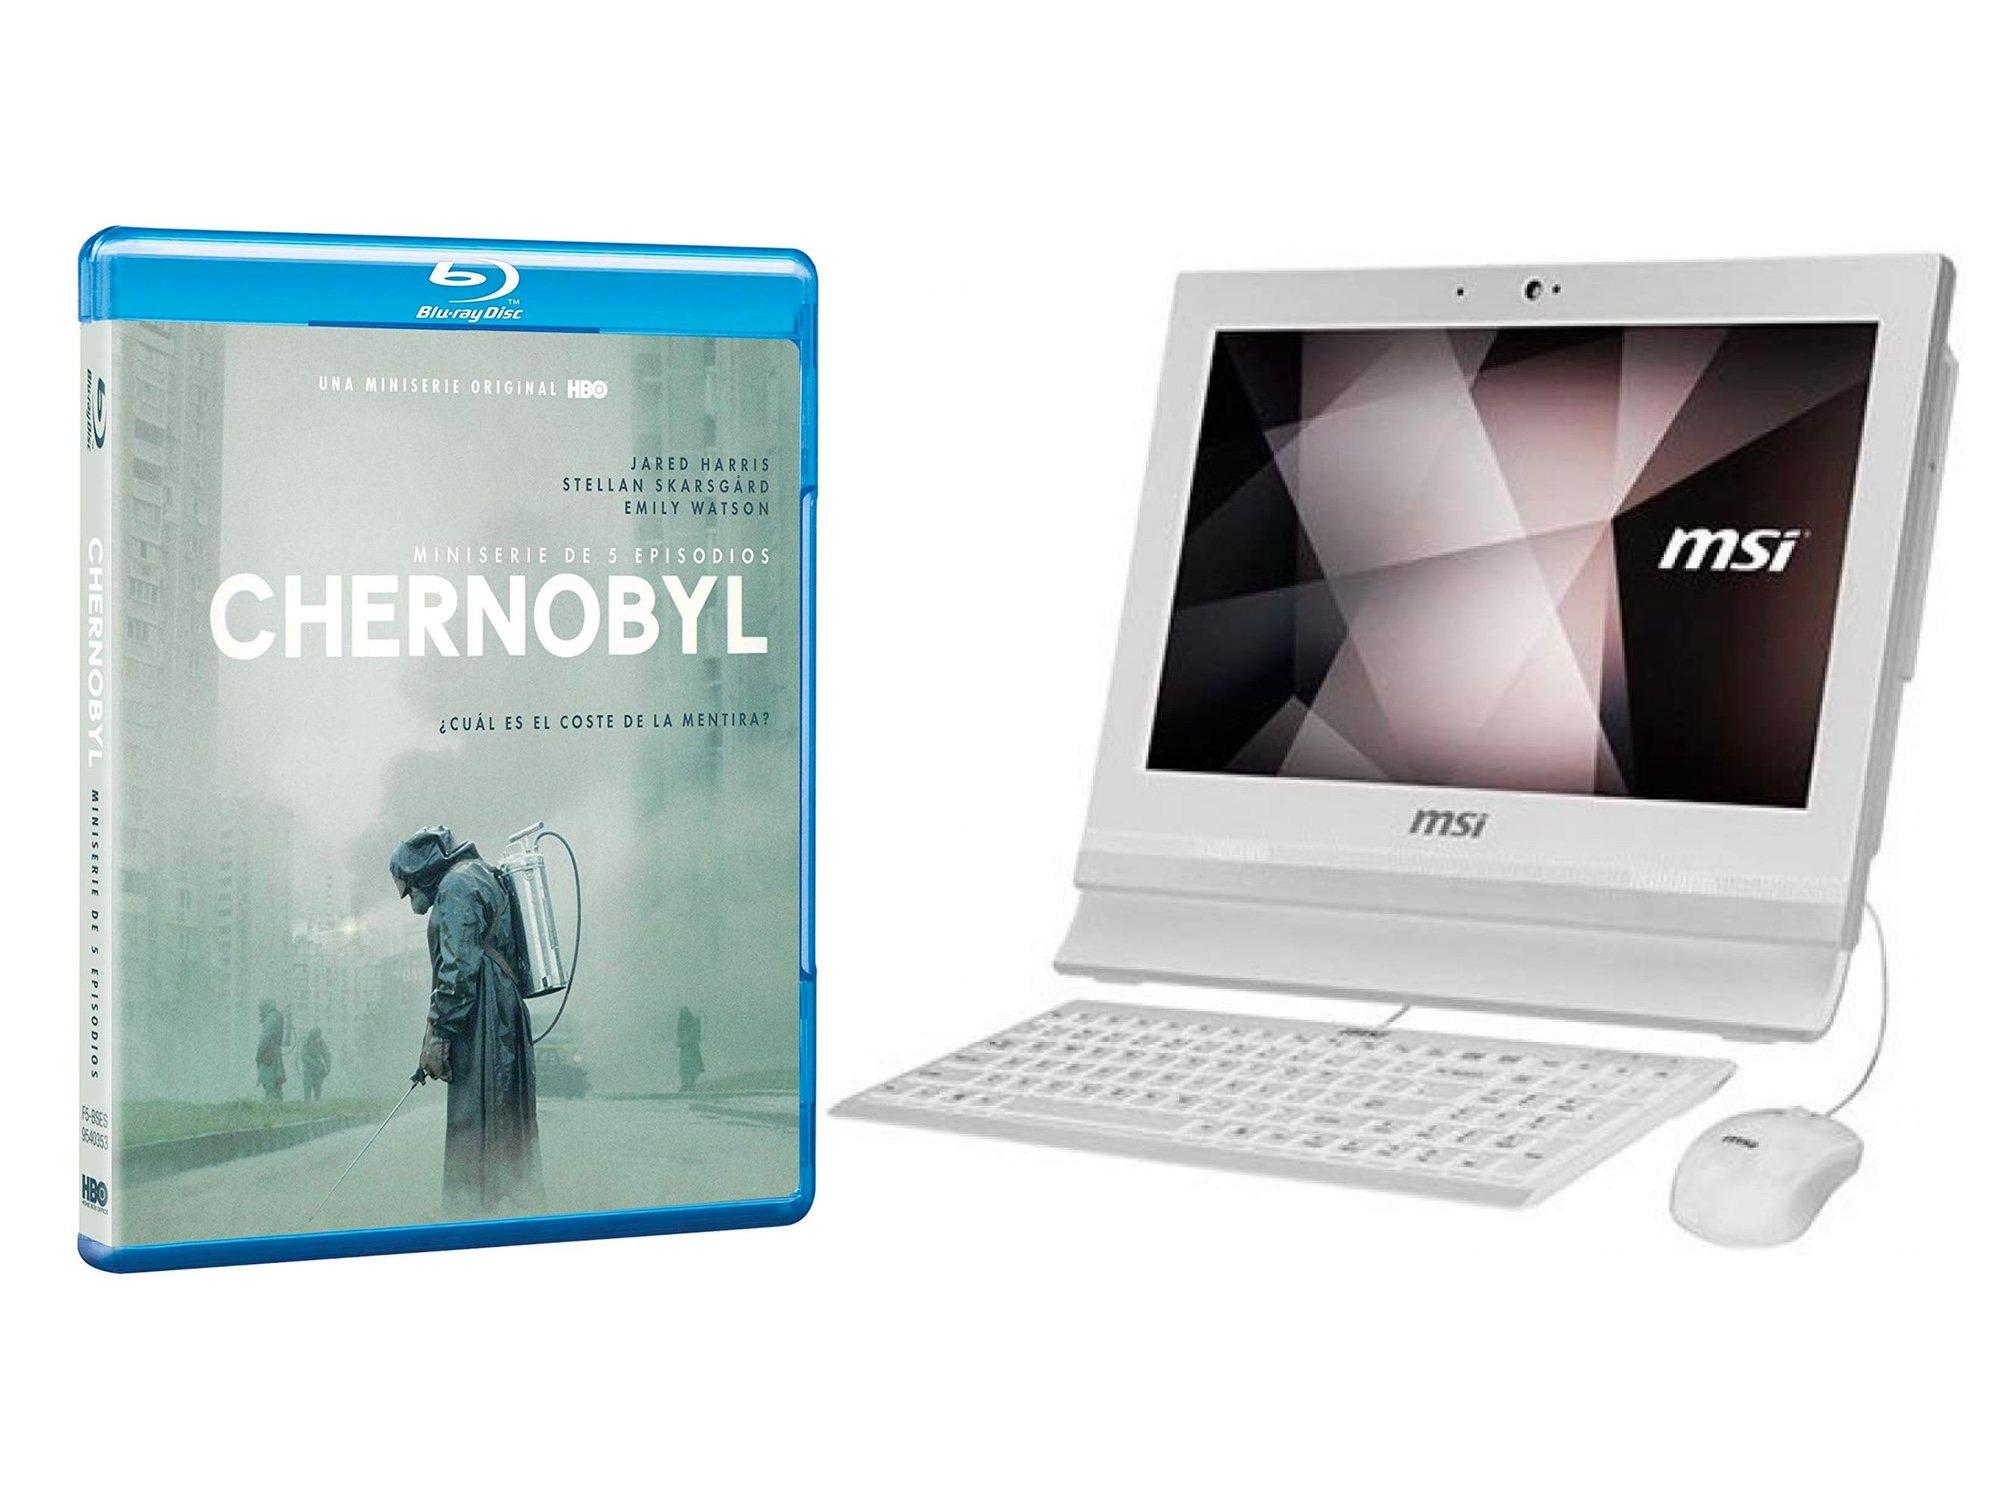 Ordinateur de bureau 'Tchernobyl' et MSI Pro